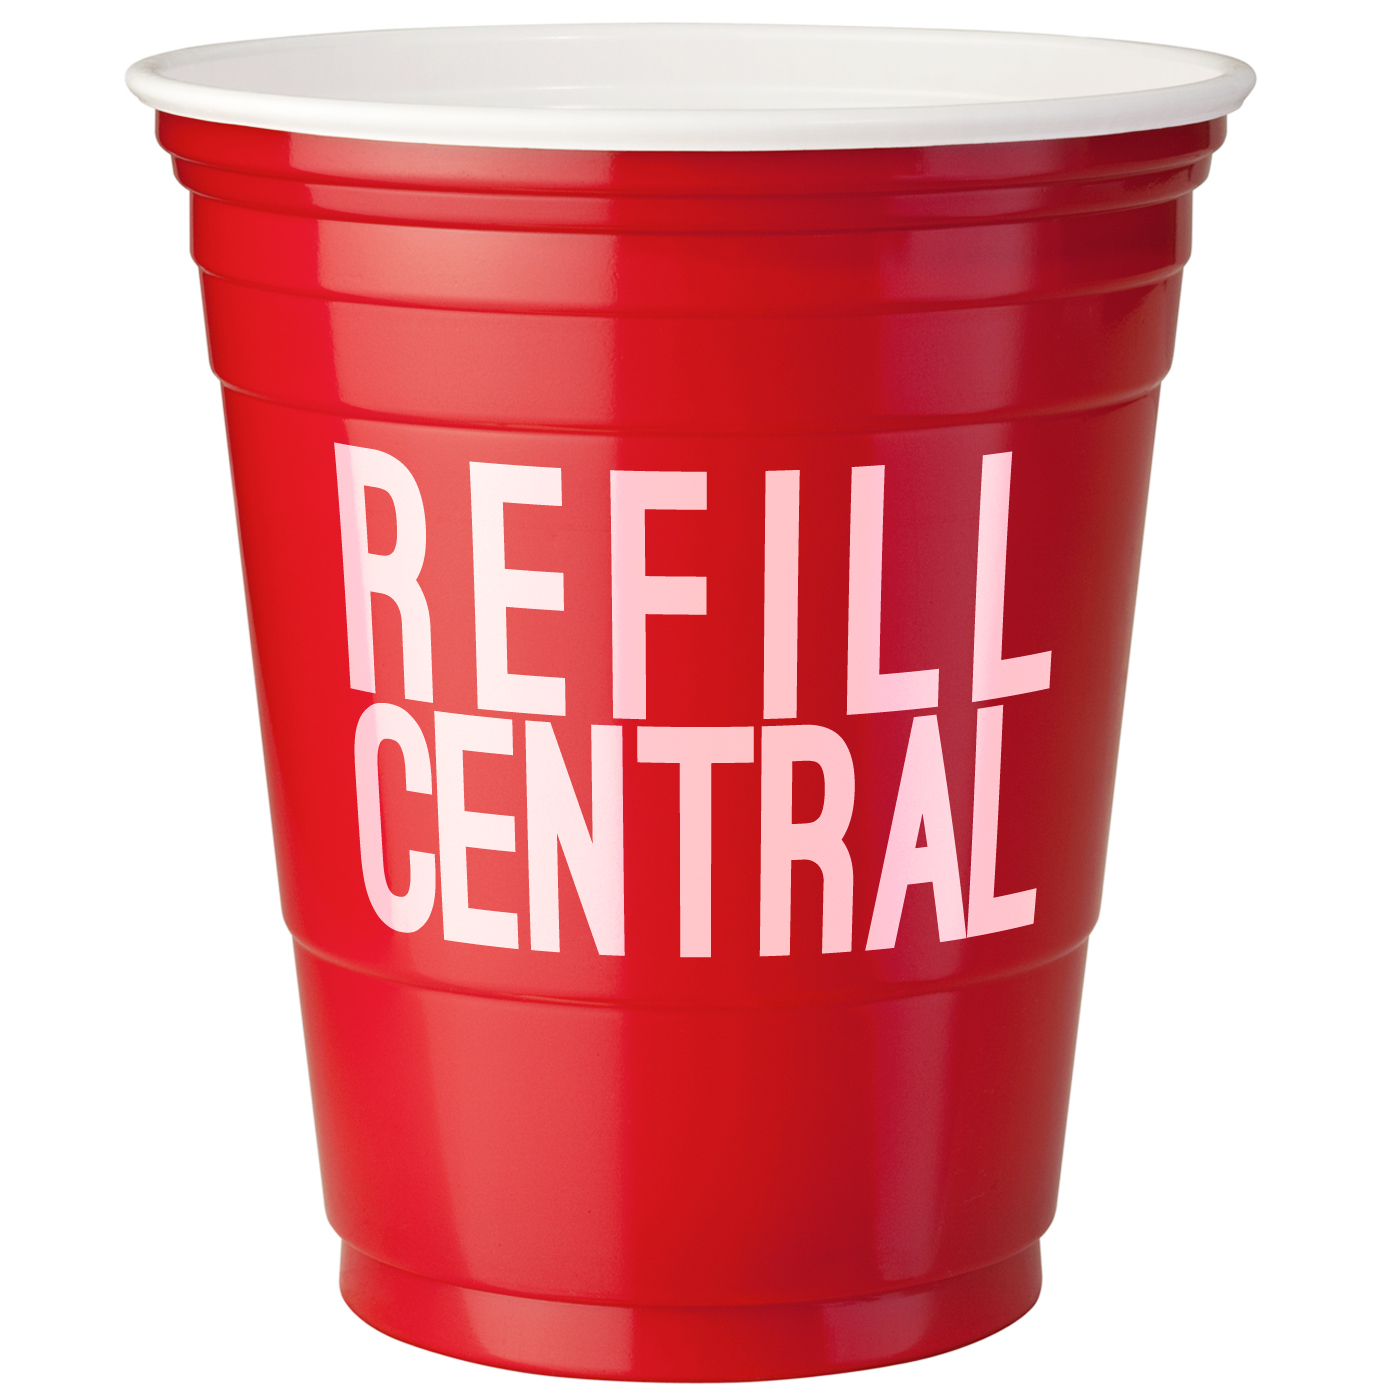 Refill Central